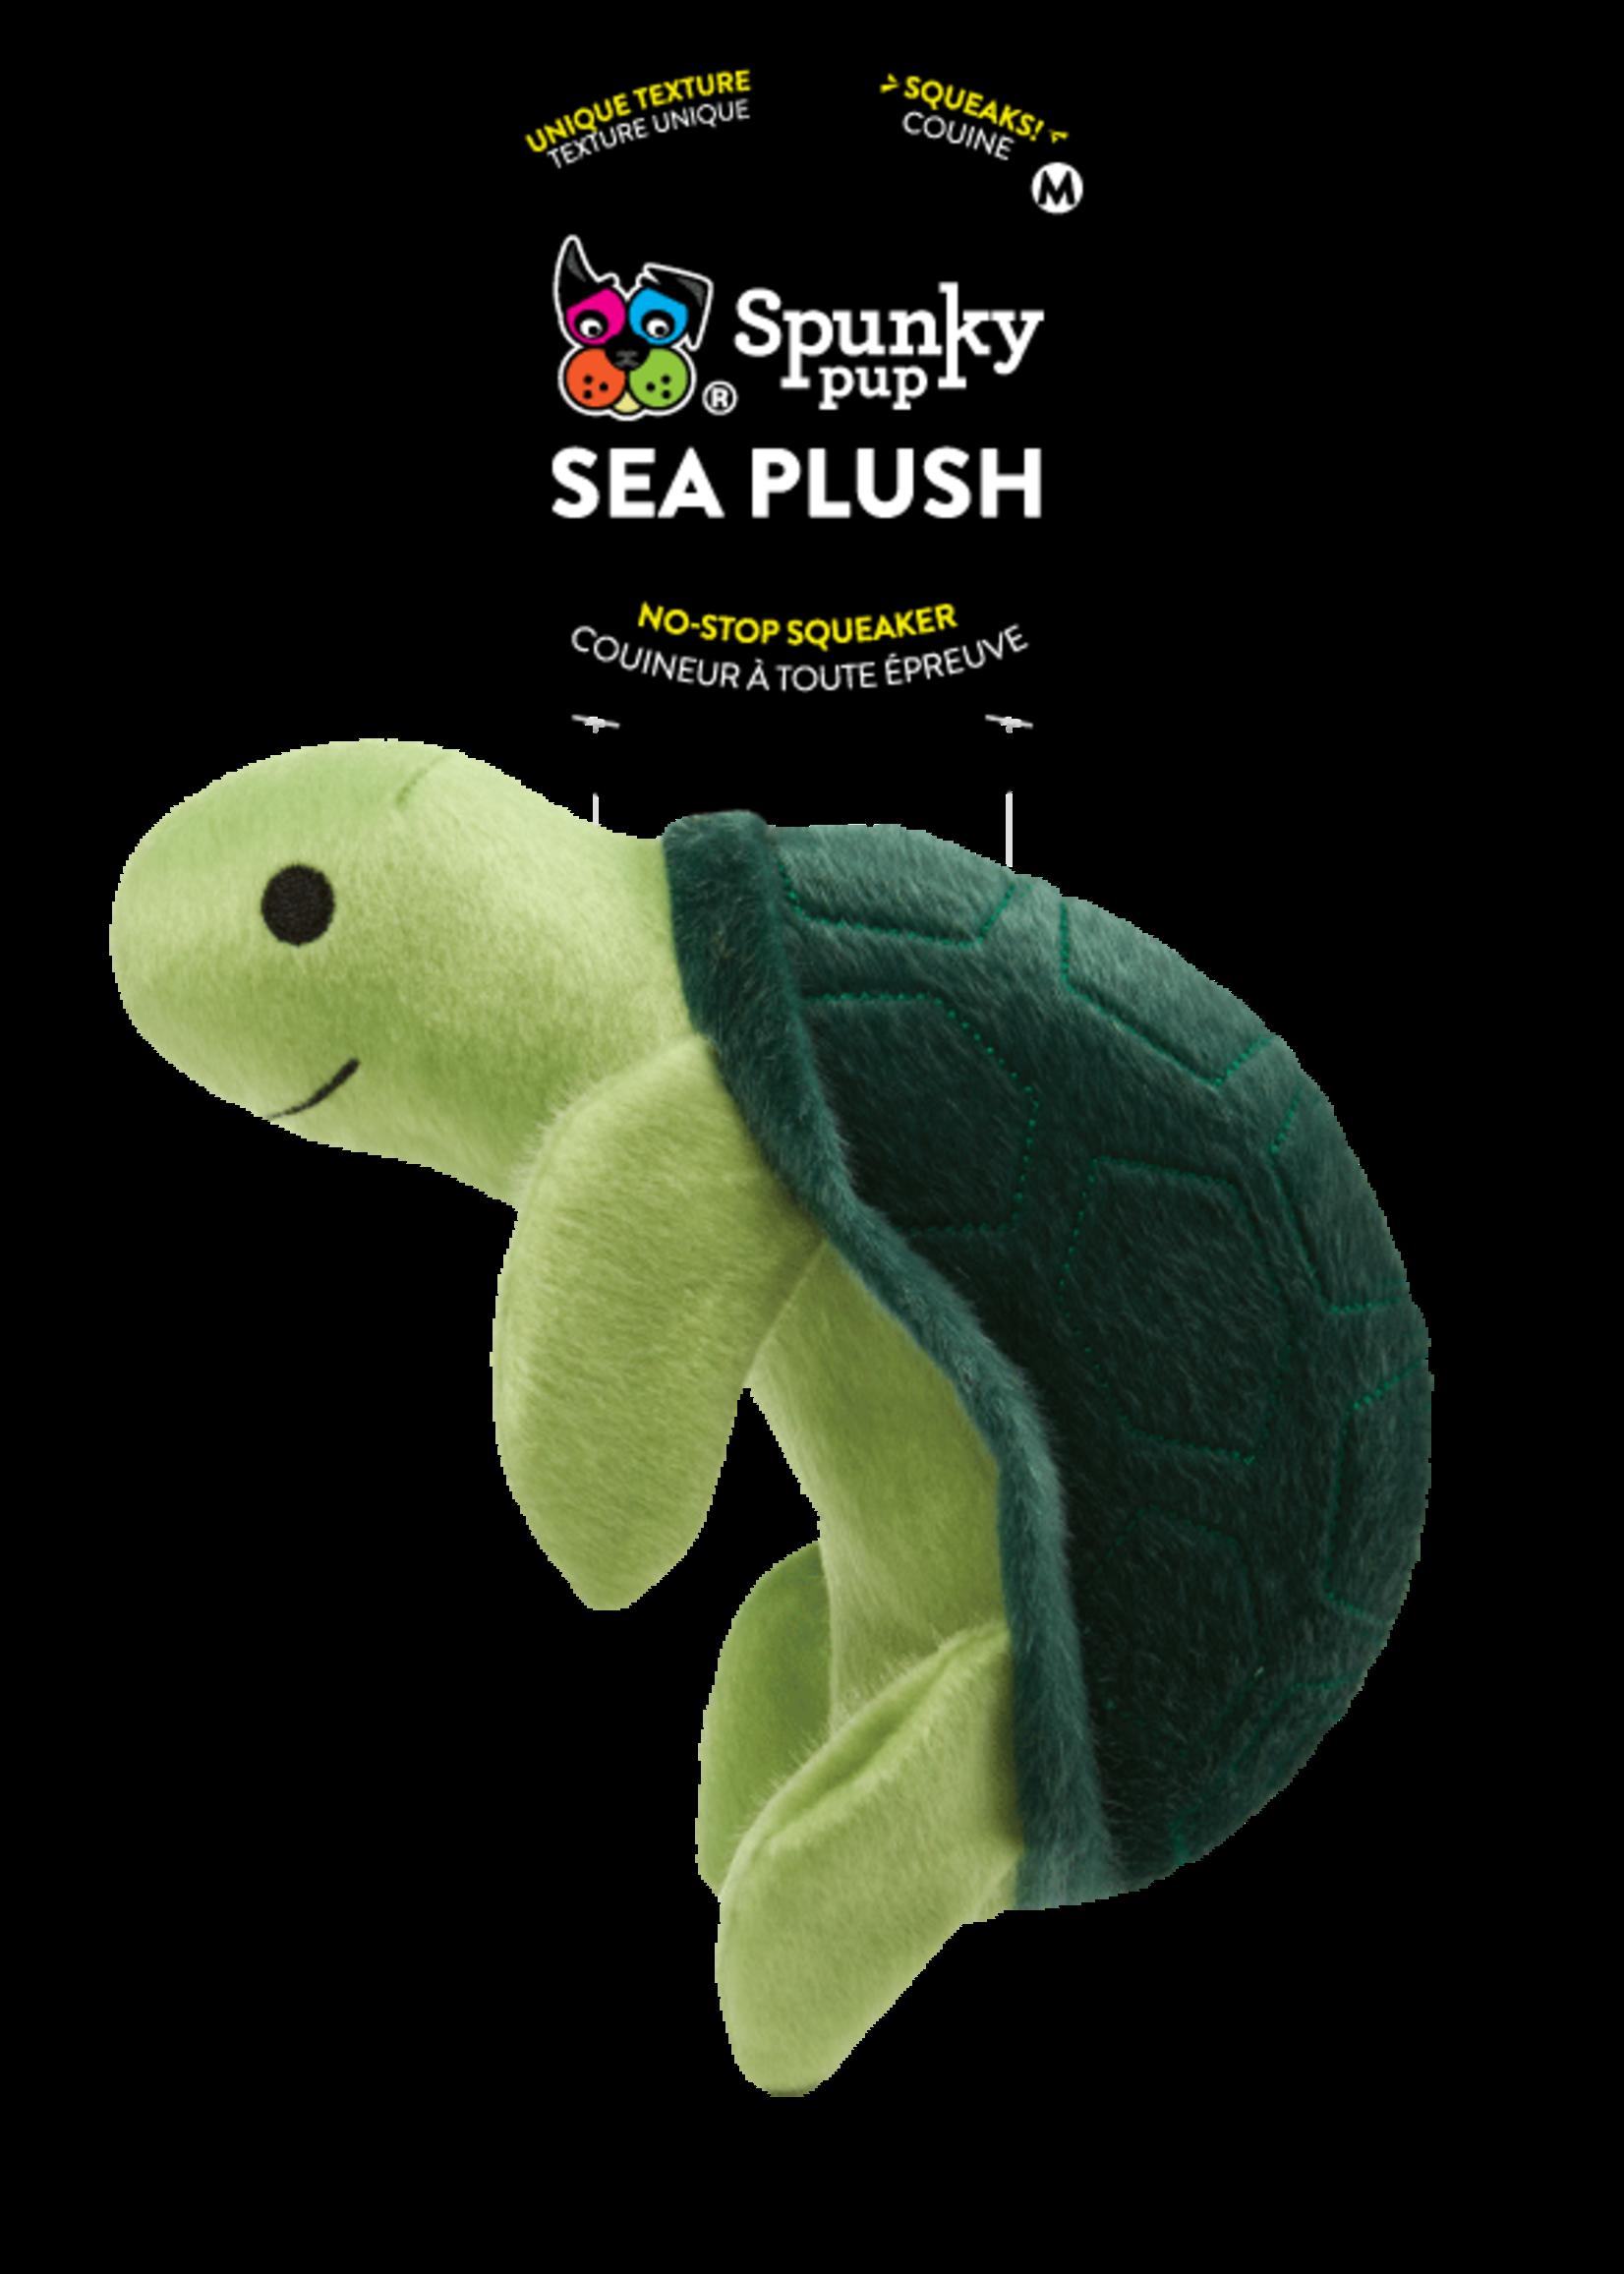 Spunky Pup Spunky Pup Sea Plush Turtle Small